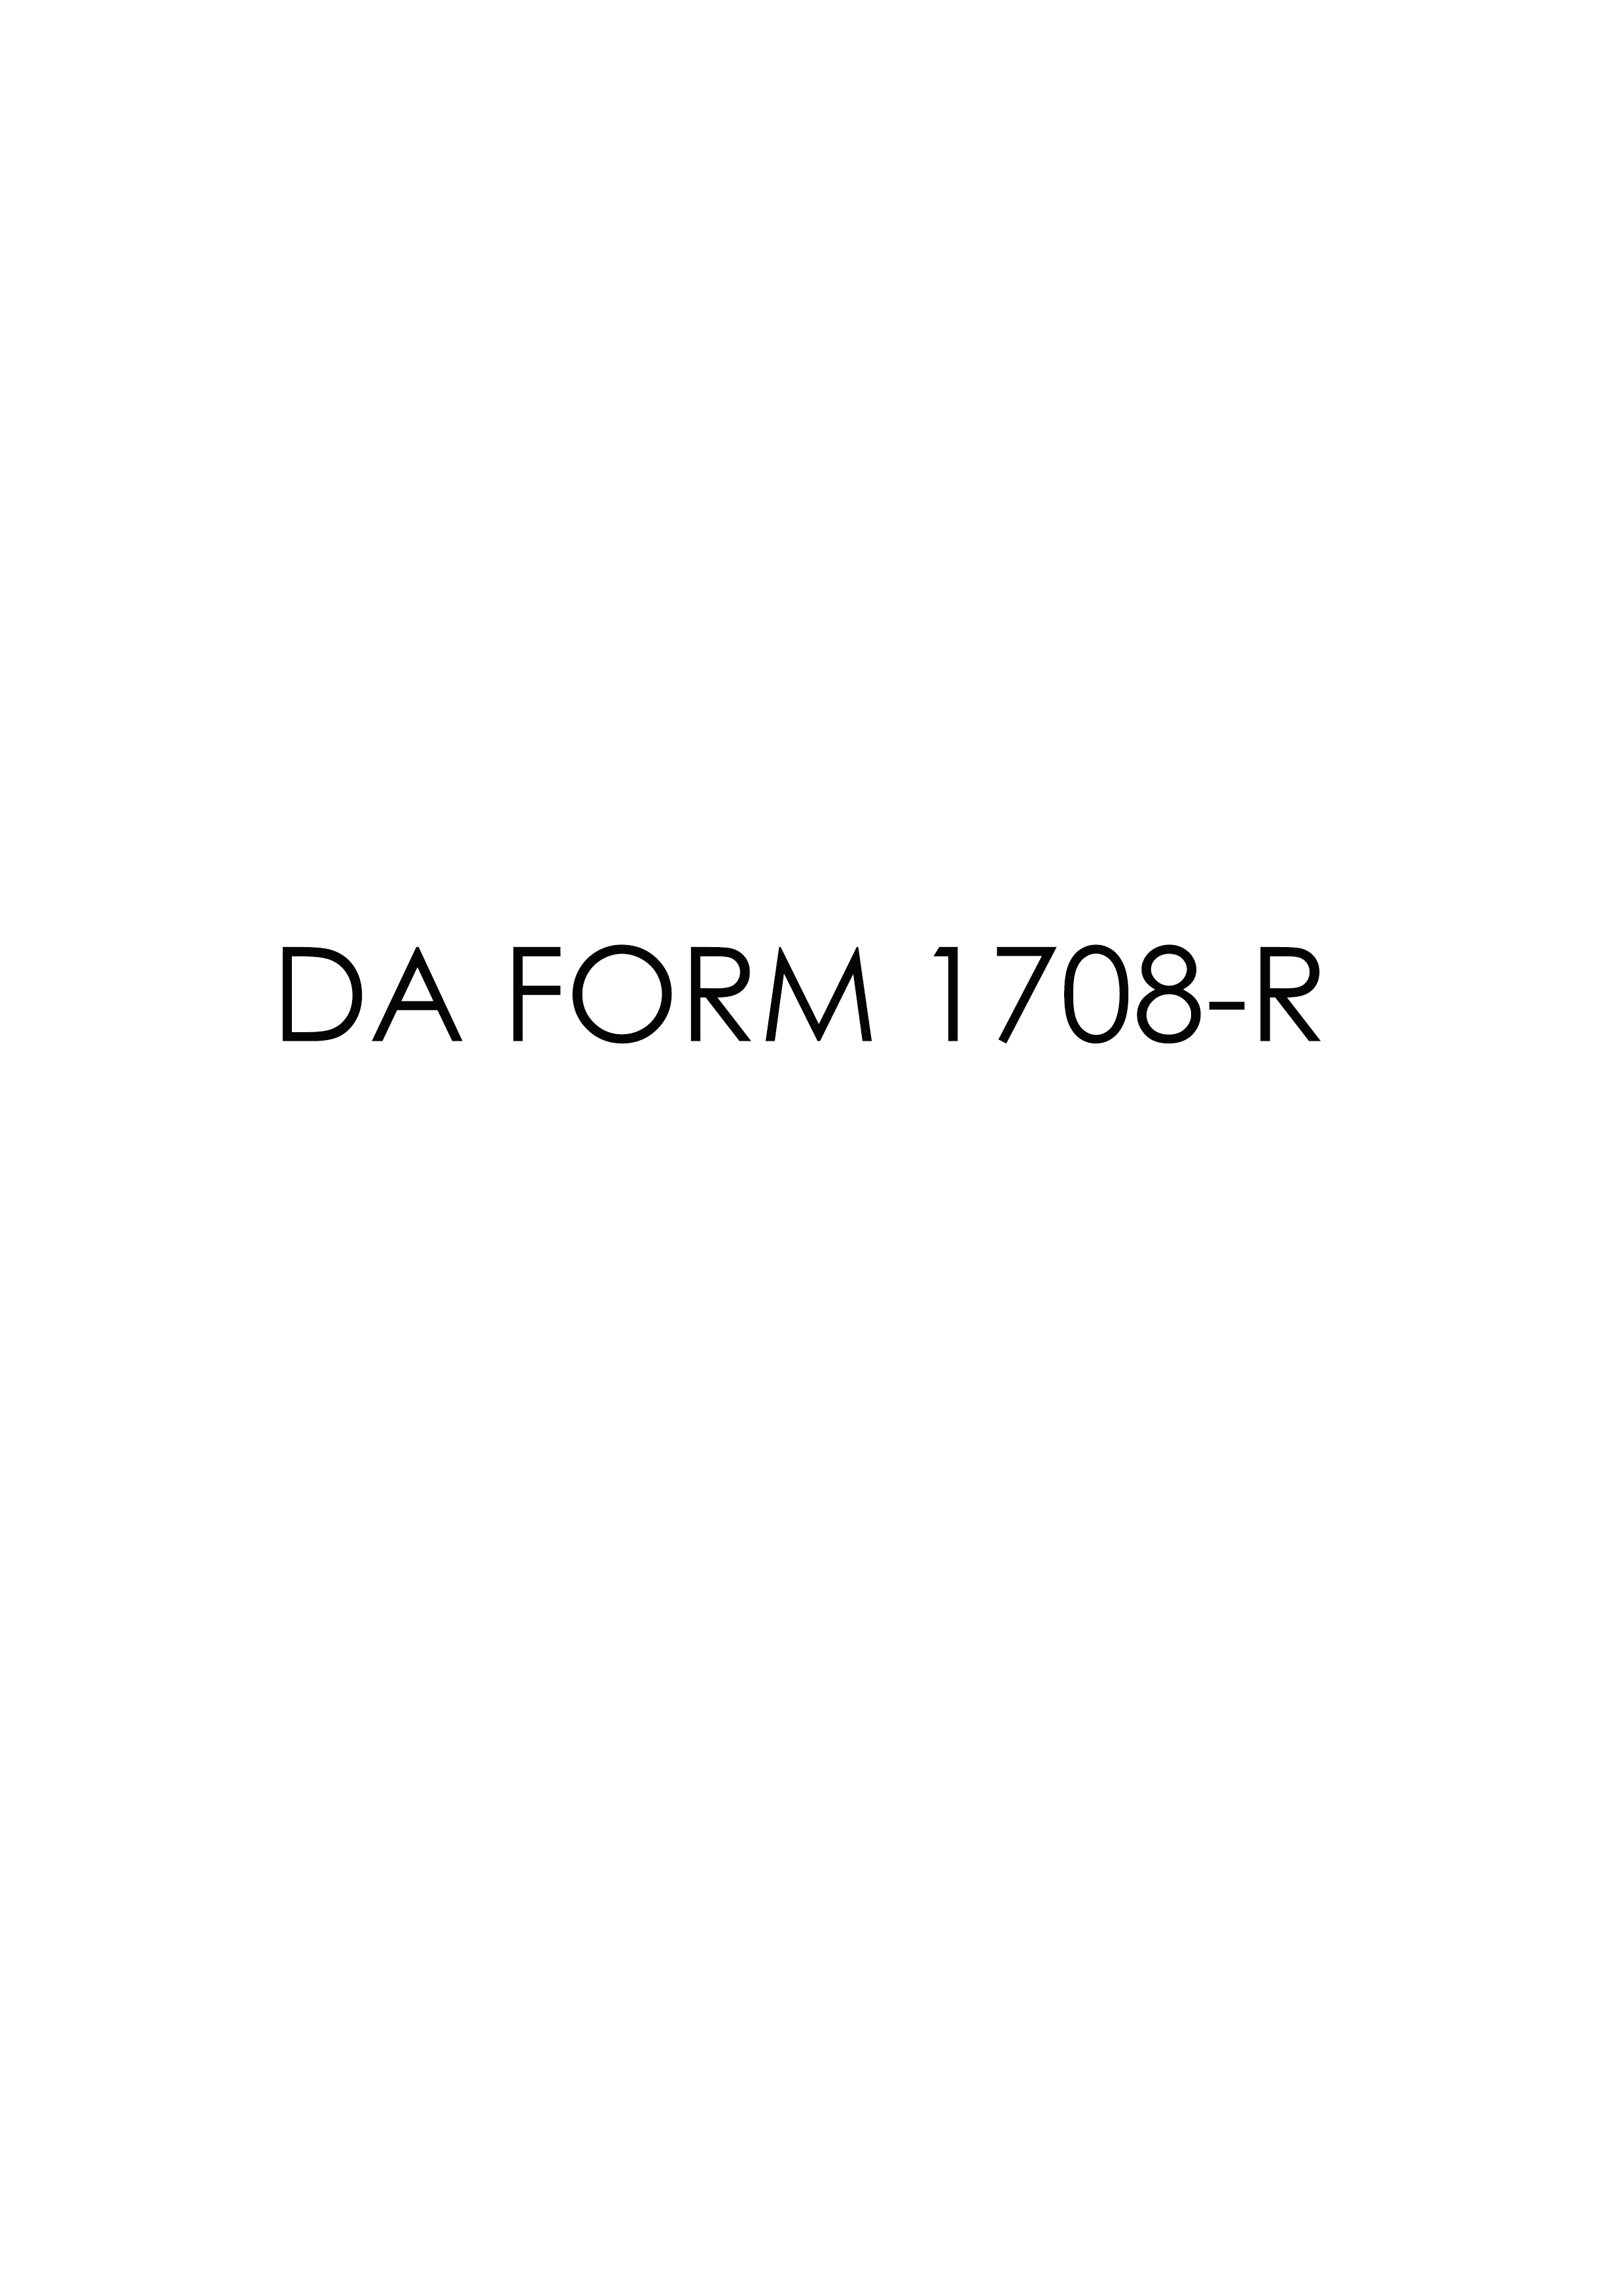 Download da Form 1708-R Free